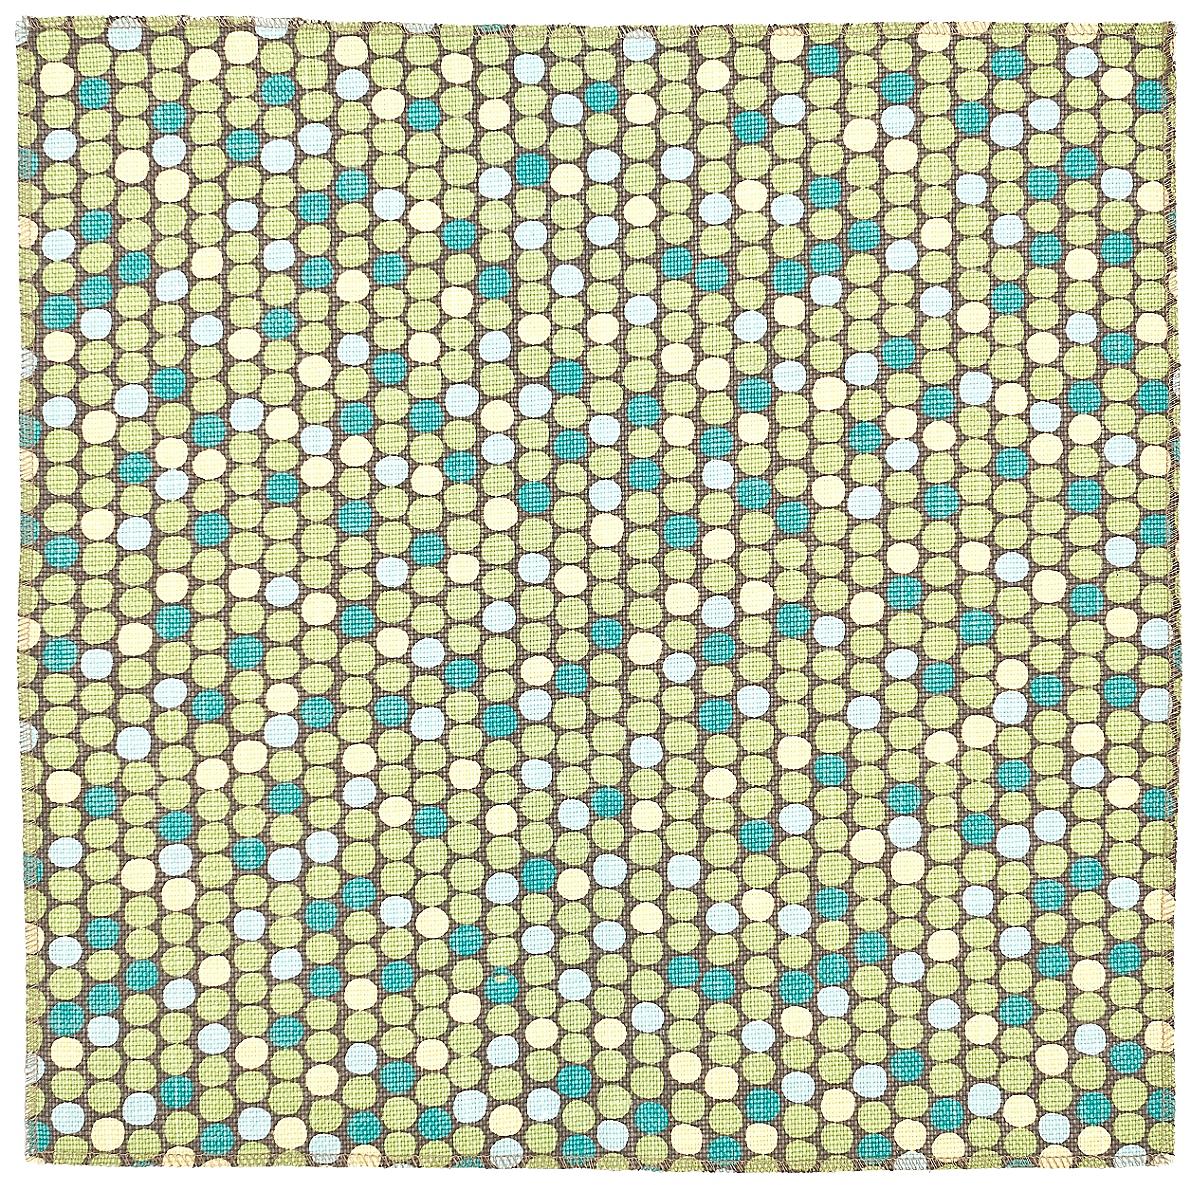 Lotsa Dots: Bark (fabric yardage)